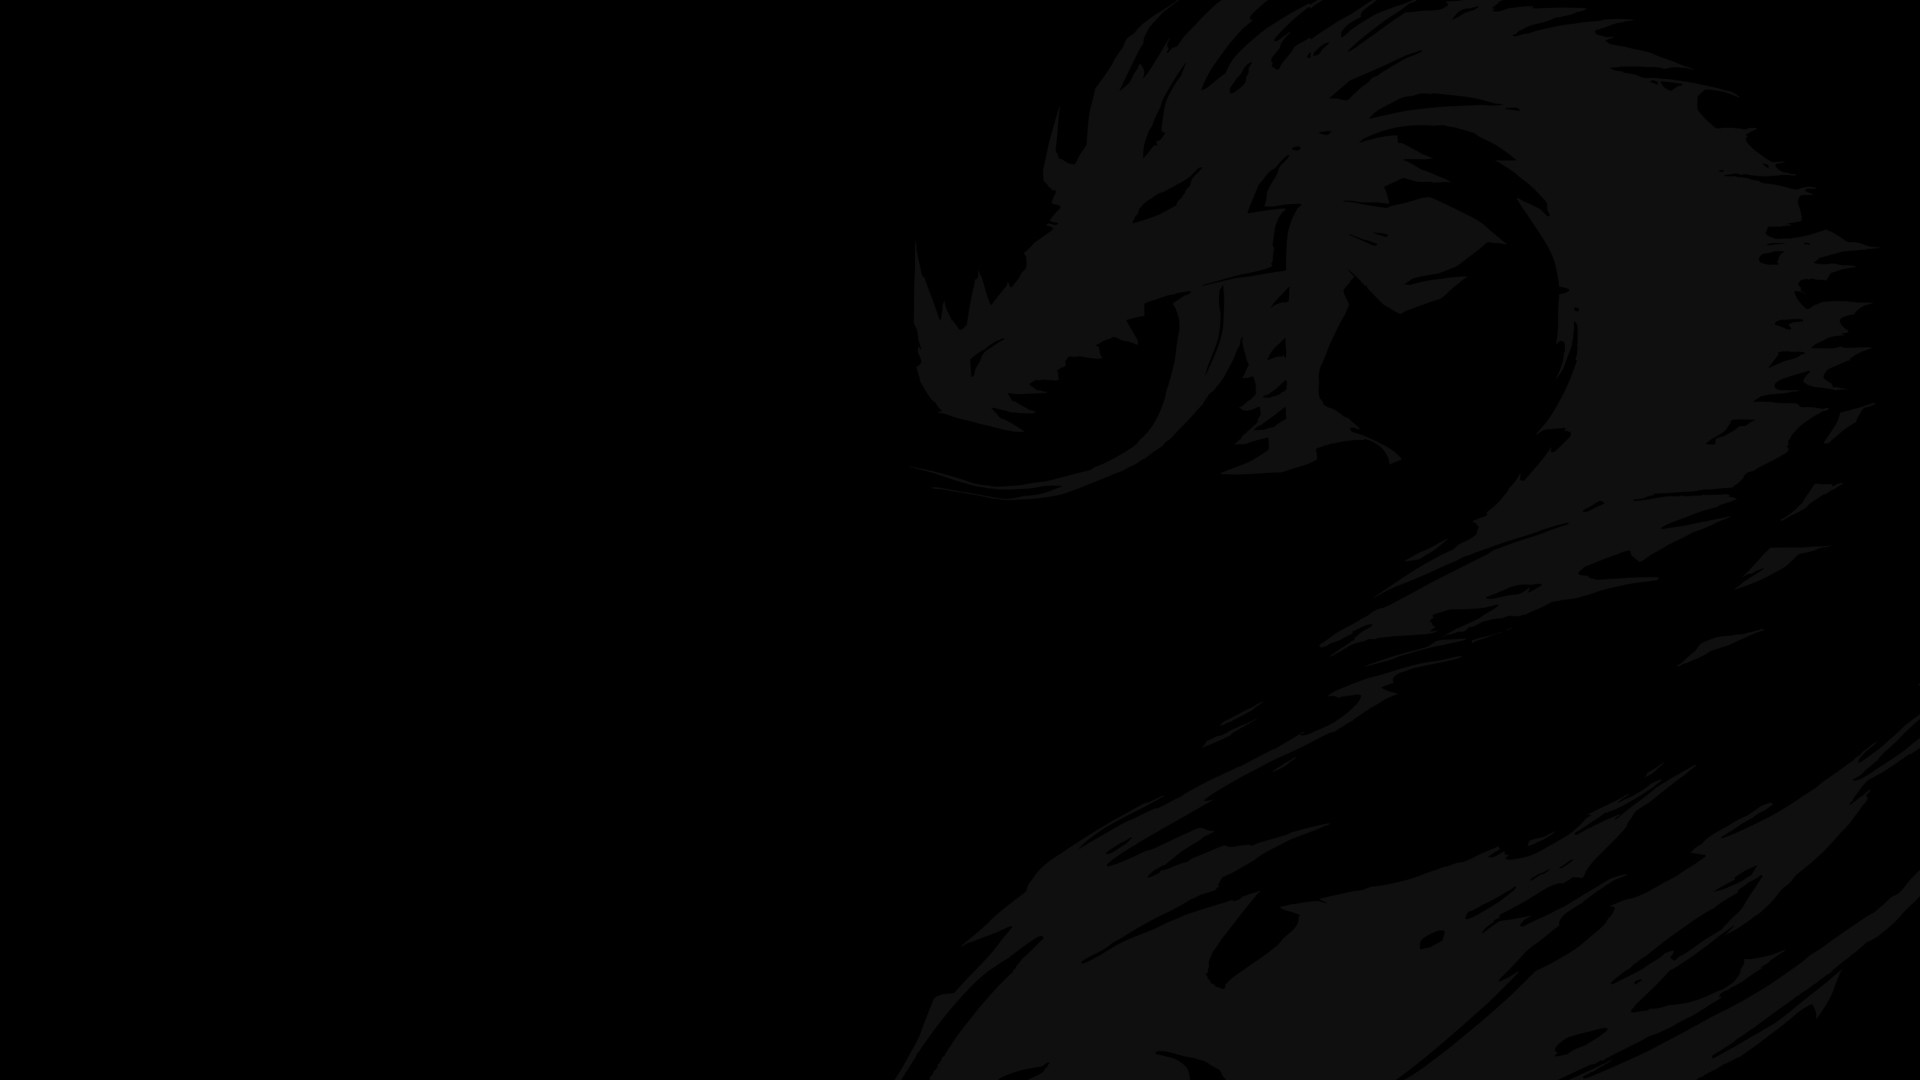 Solid Black Wallpaper | wallpaper, wallpaper hd, background desktop